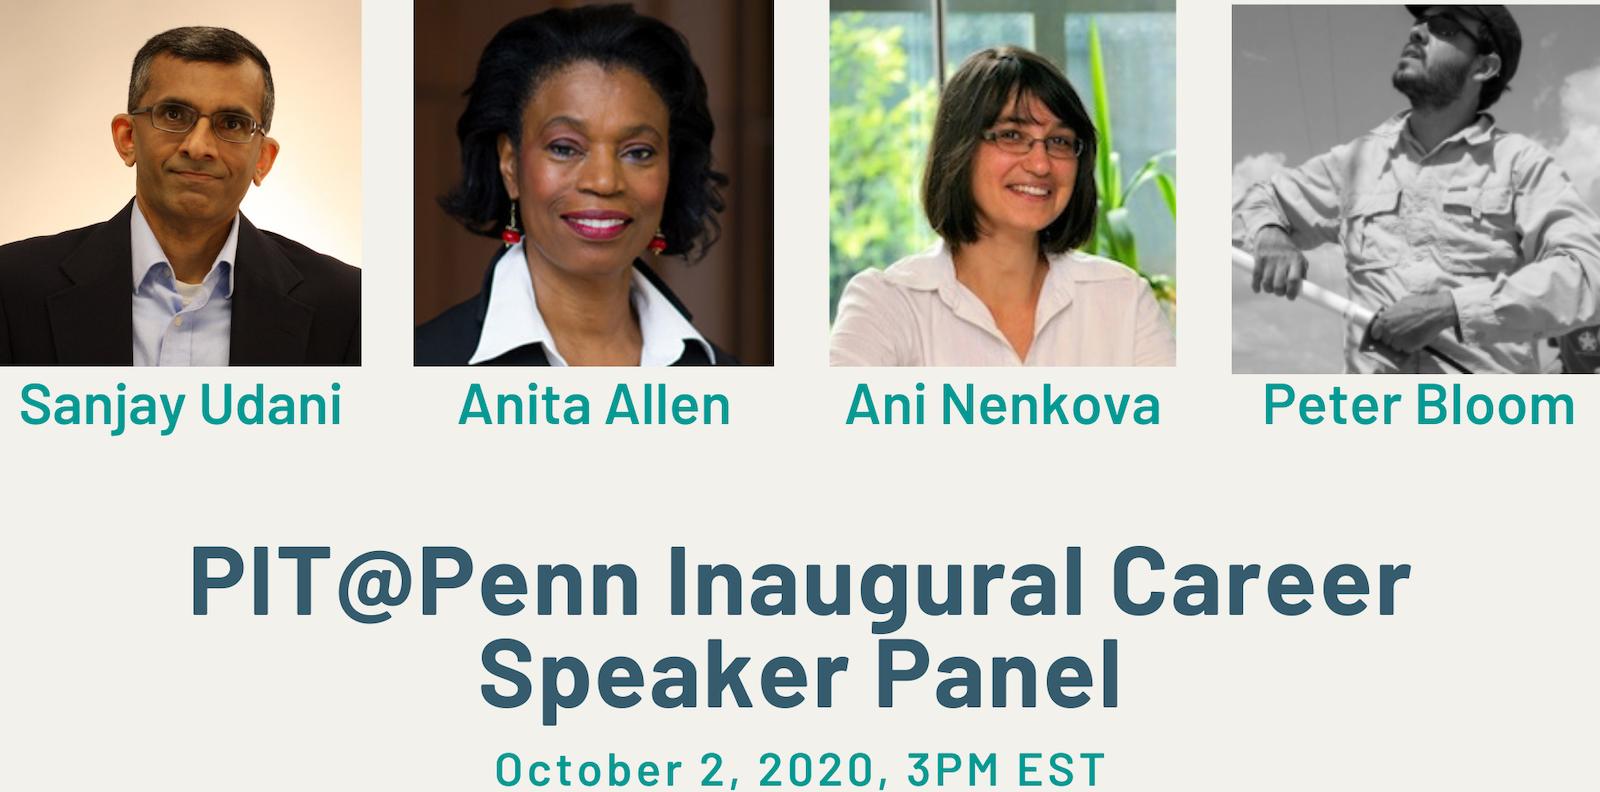 Photos of Sanjay Udani, Anita Allen, Ani Nenkova, and Peter Bloom PIT@Penn Career event